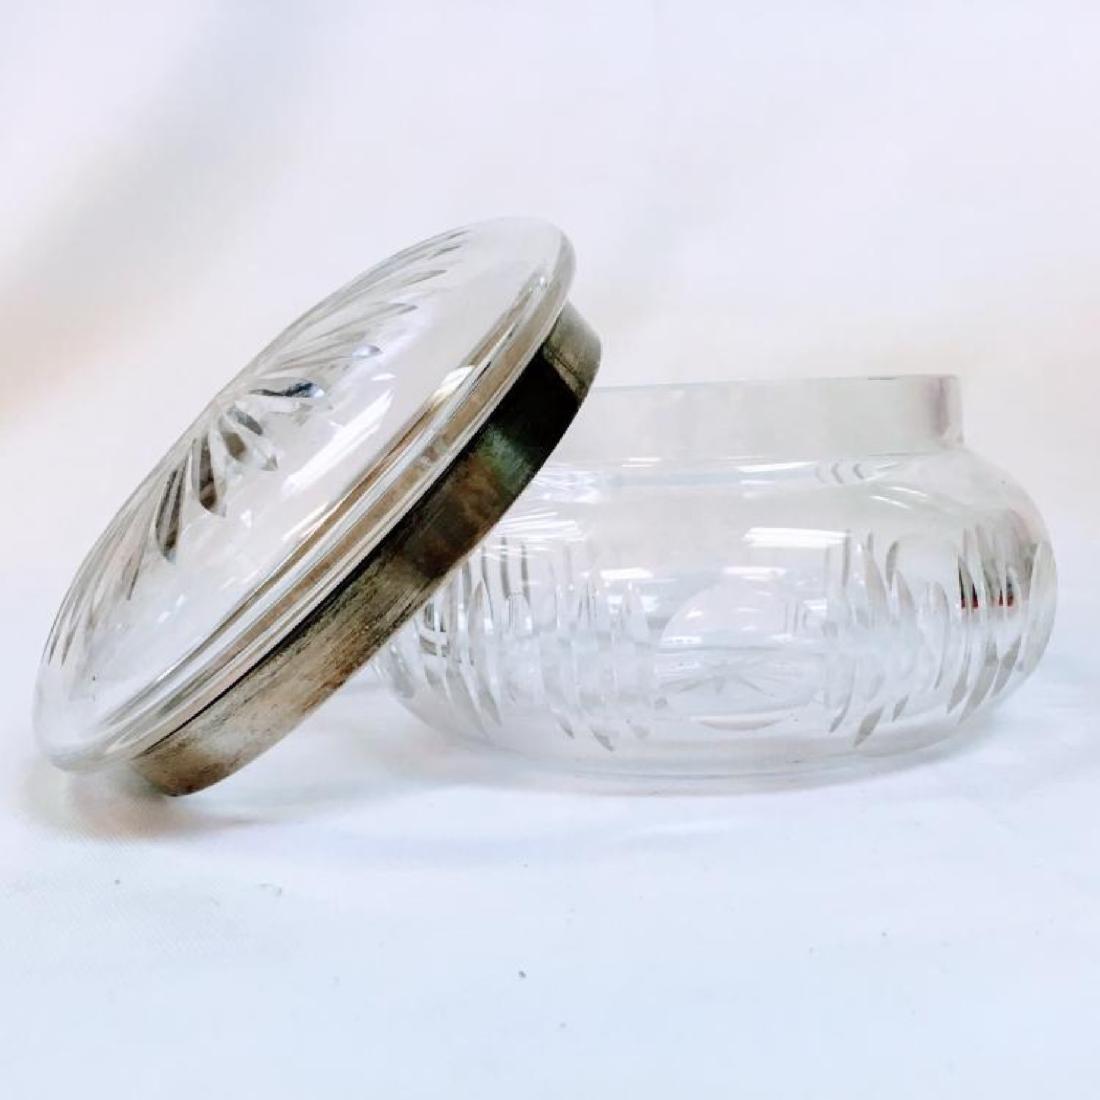 ANTIQUE STERLING SILVER LIDDED CUT GLASS POWDER JAR - 5